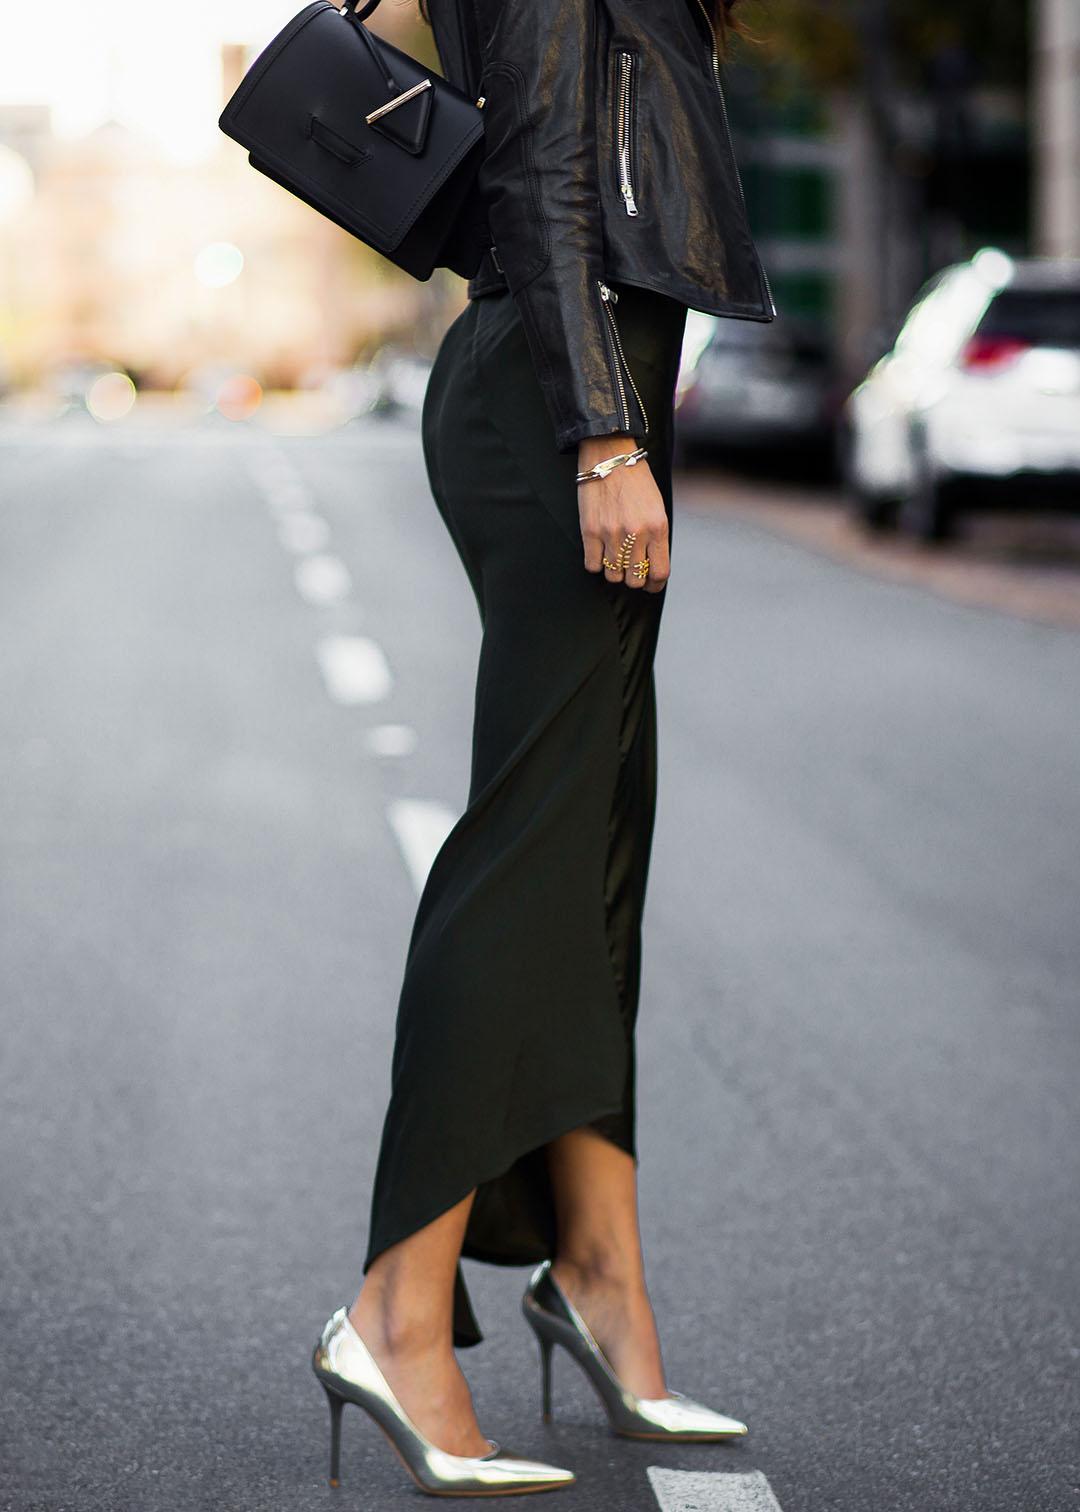 MLM_Satin_Dress_Jimmy_Choos_Camelia_Roma.jpg